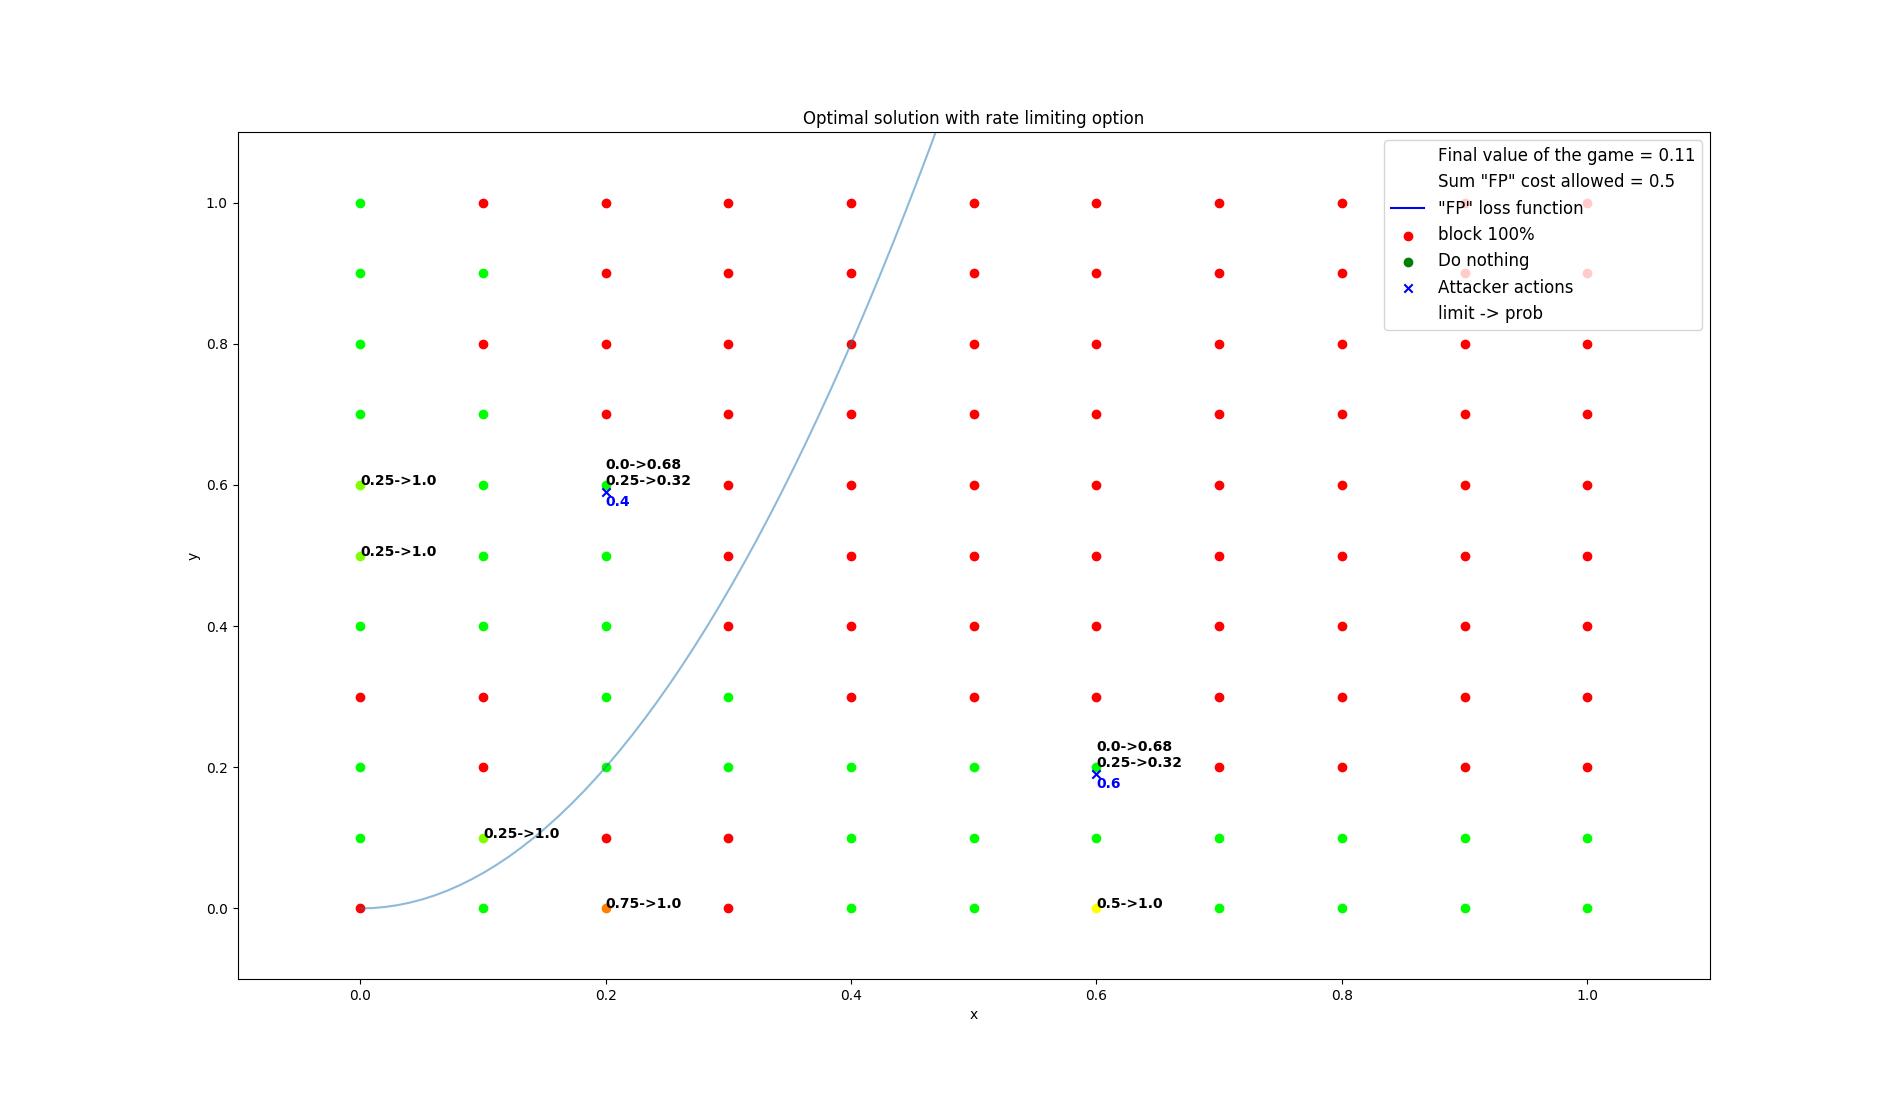 results/optimal/false_positive_constraint/10-summarization.png